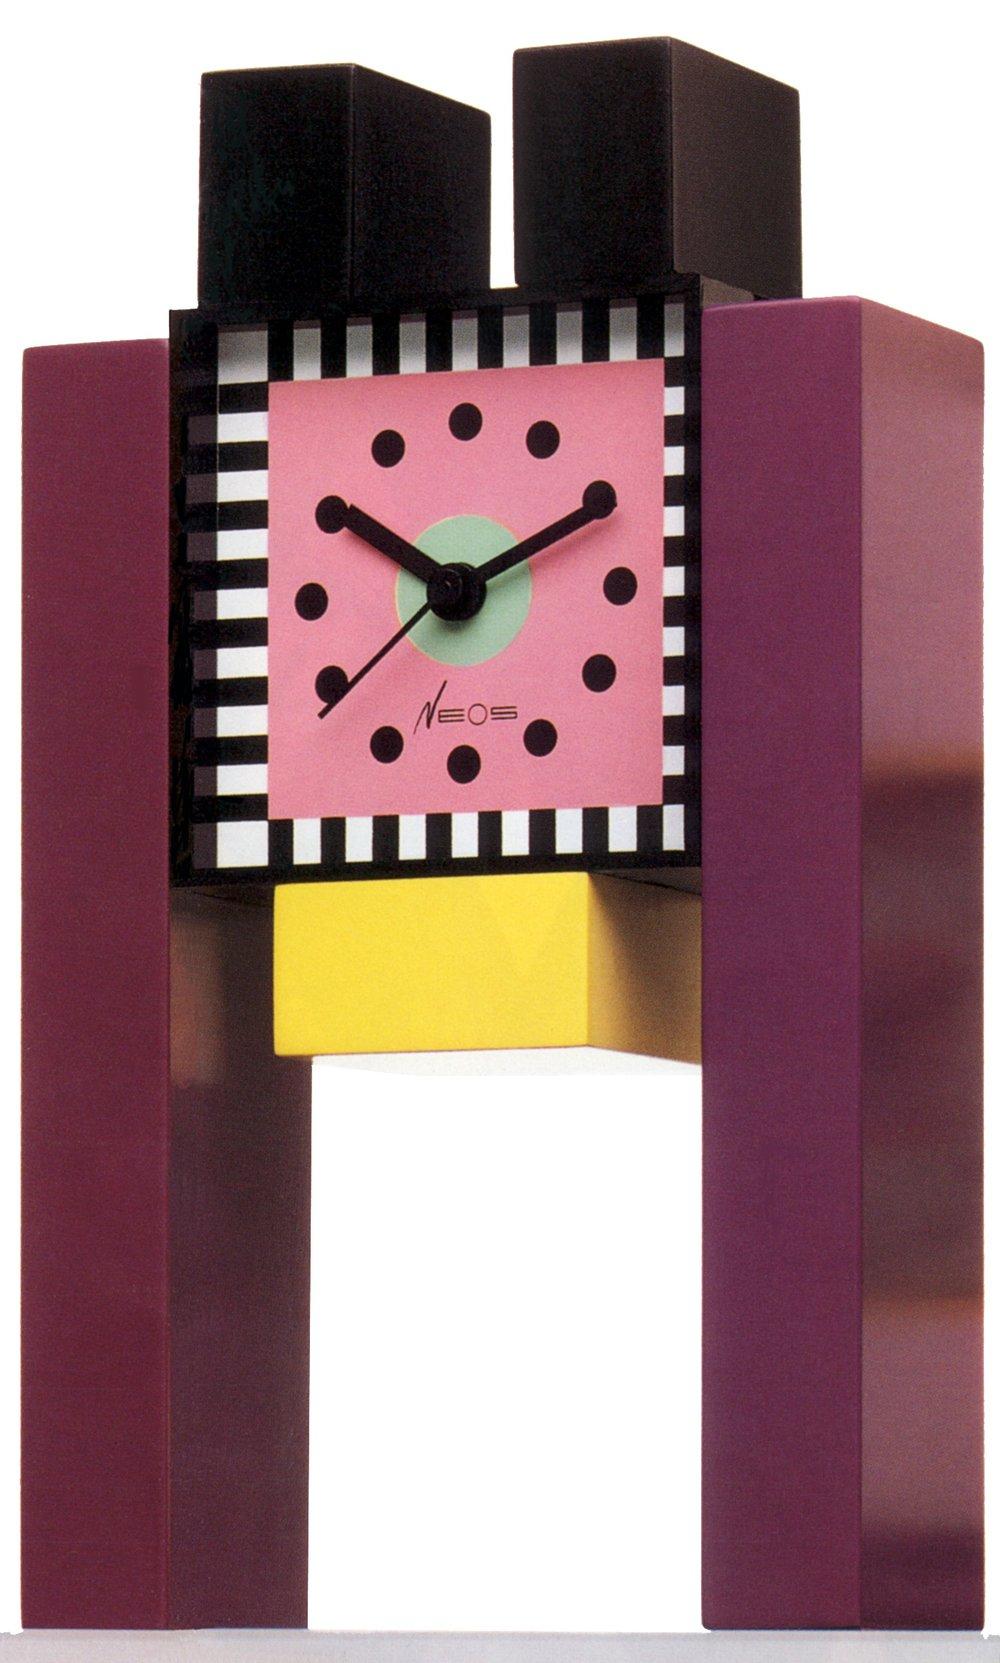 Lorentz_Neos_Clocks_021.jpg